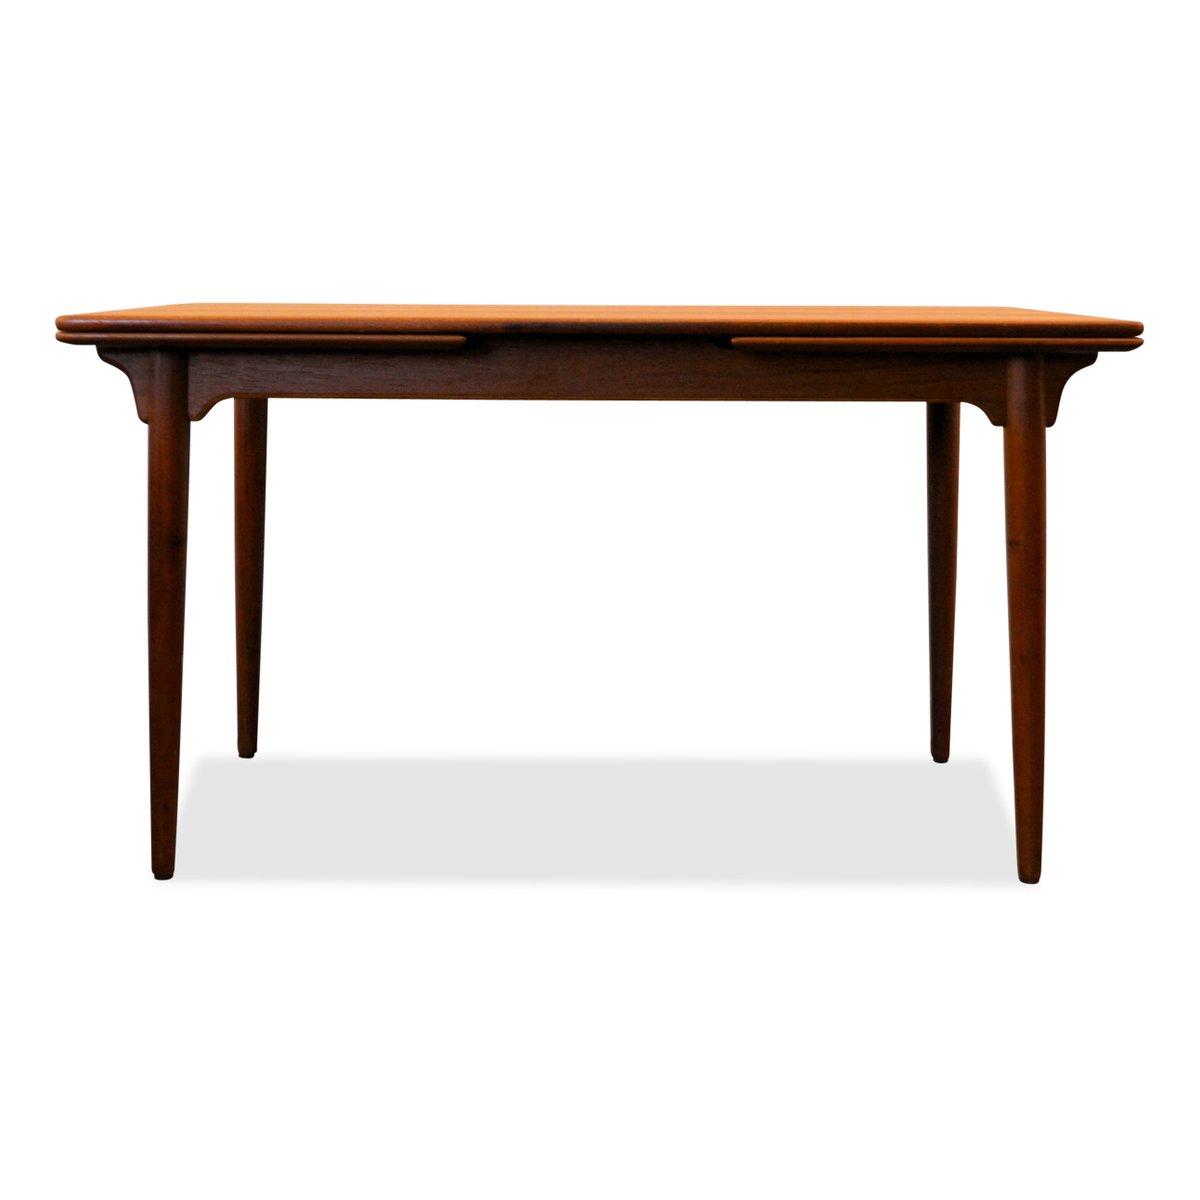 Danish Teak Extendable Dining Table by Gunni Omann for  : danish teak extendable dining table by gunni omann for omann juns mobelfabrik 1960s 2 from www.pamono.com size 1200 x 1200 jpeg 33kB